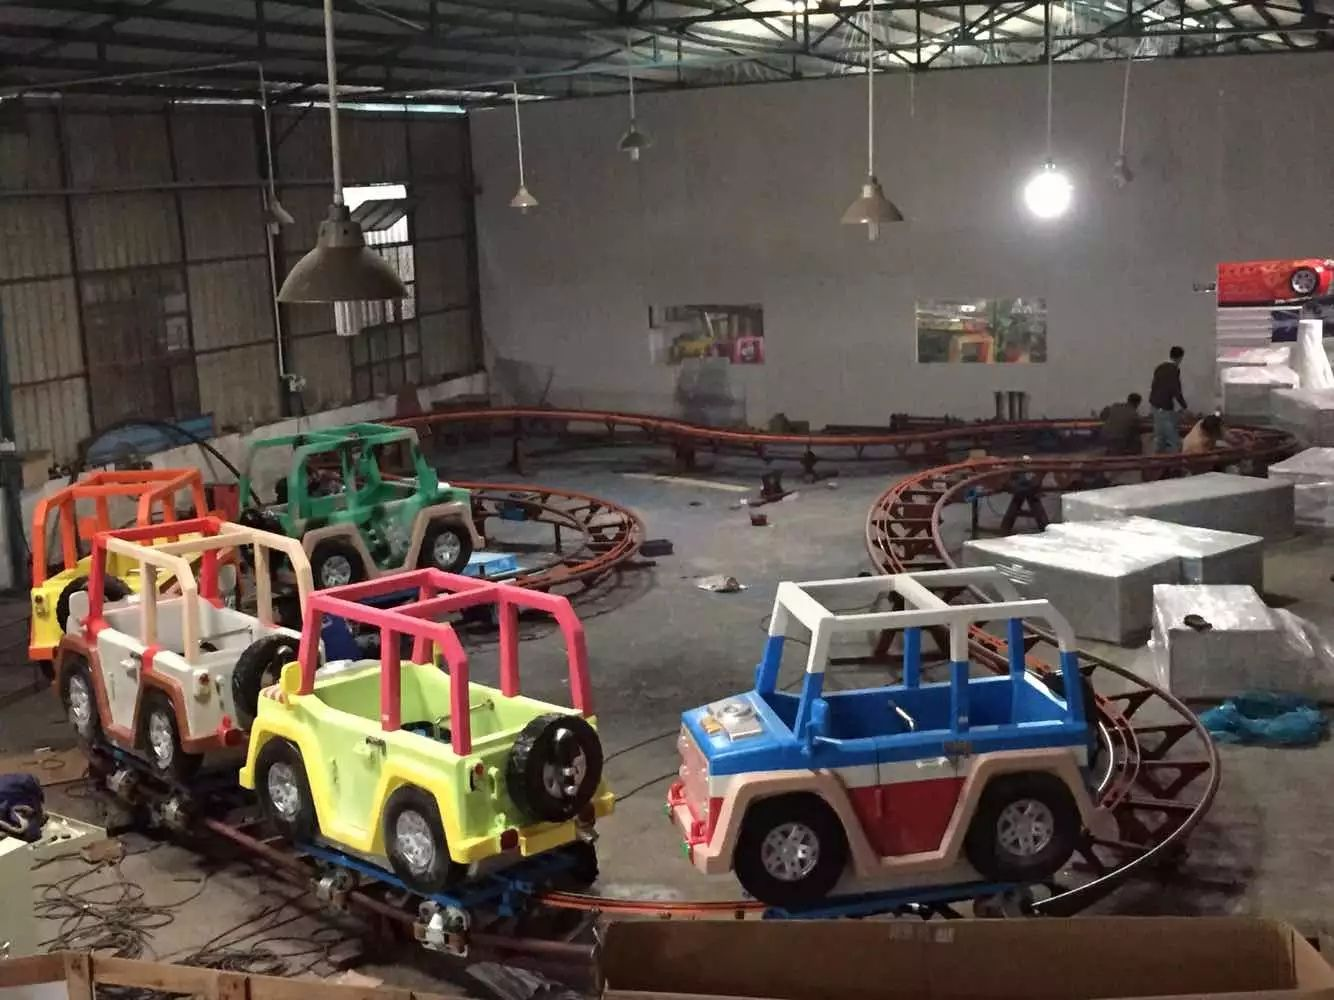 Kids Roller Coaster For Sale Buy Beston Best Backyard Coaster And